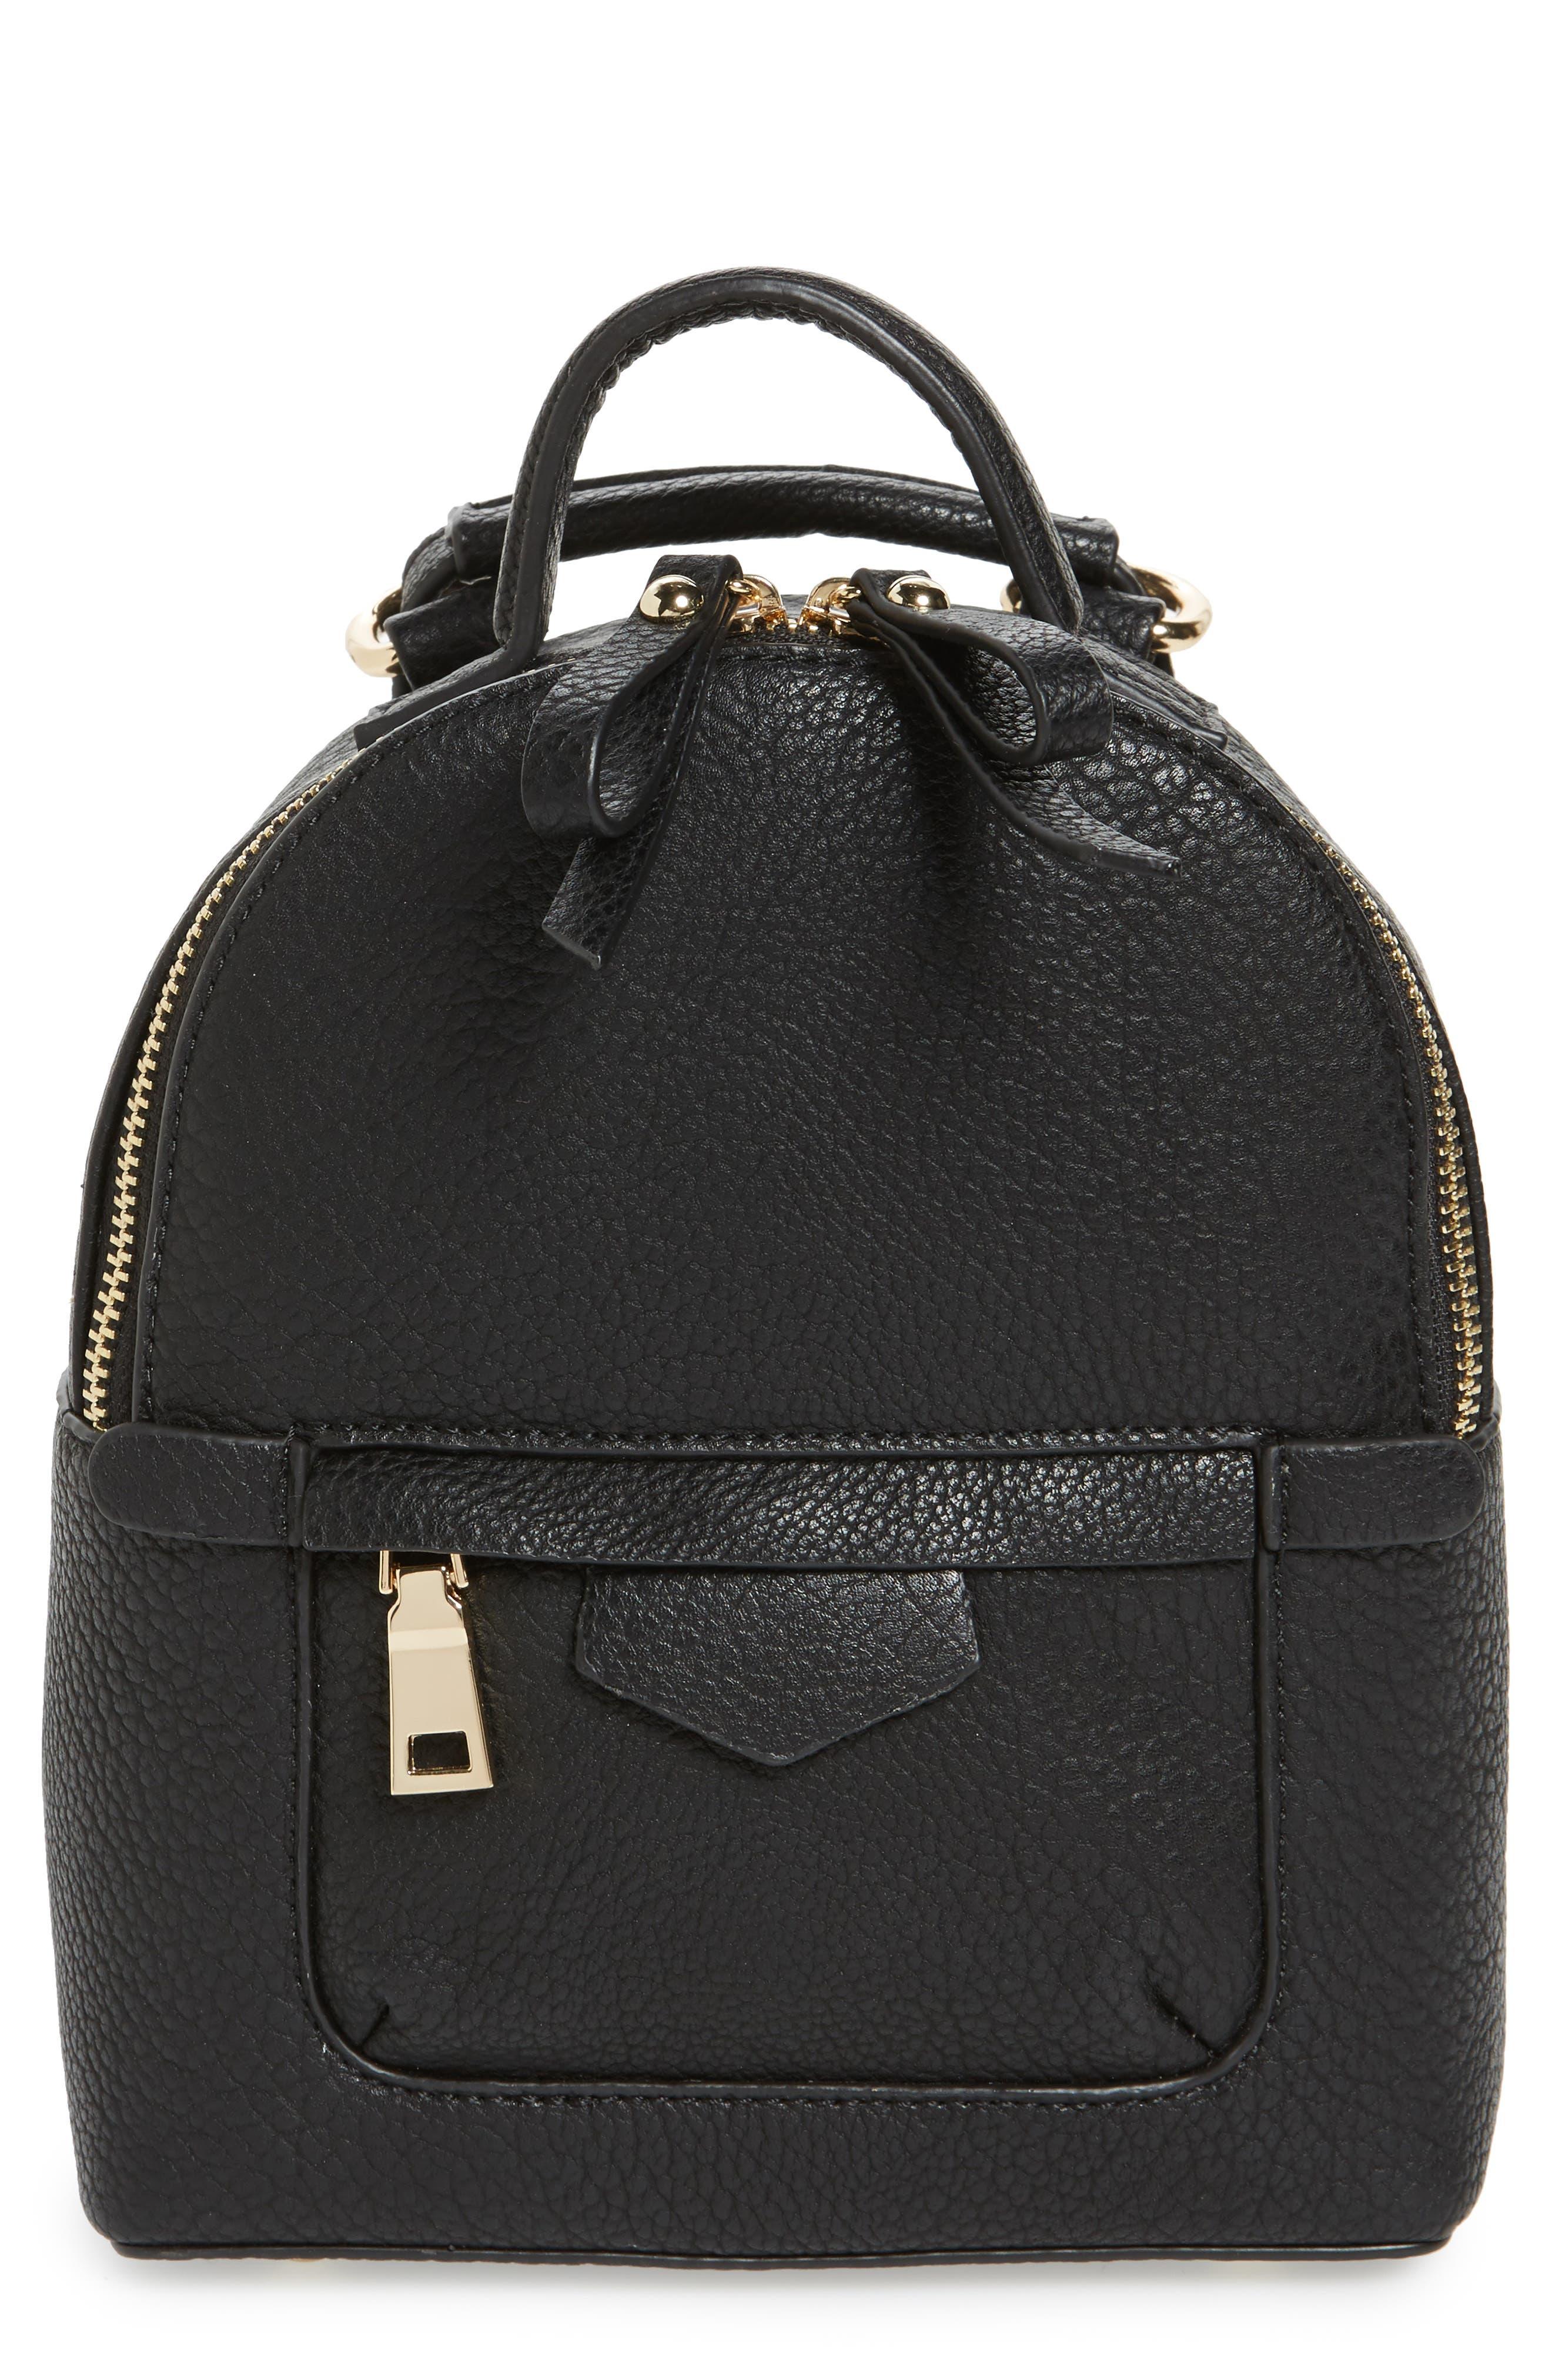 Main Image - BP. Mini Backpack Crossbody Bag